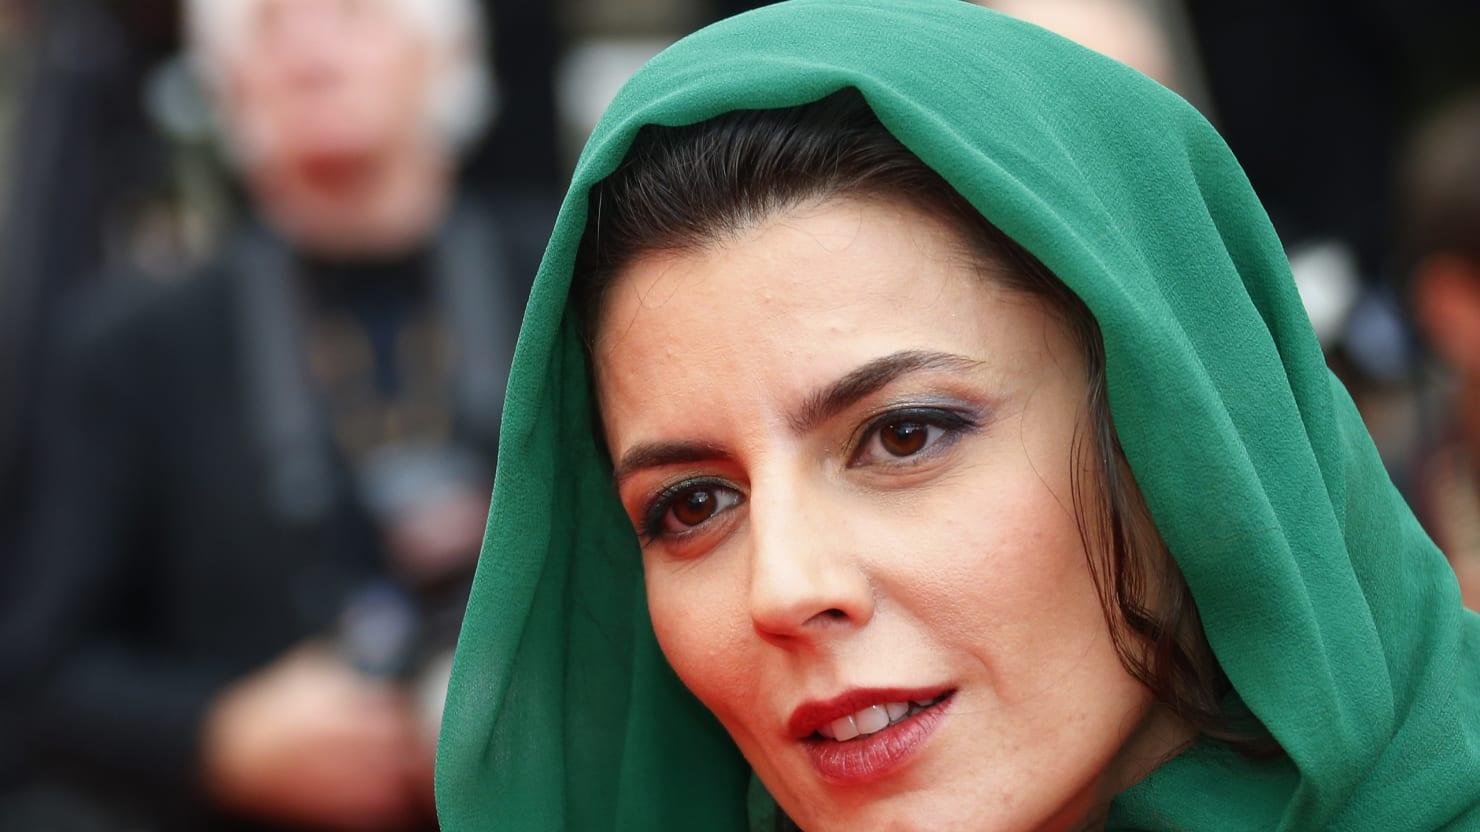 iranian actress faces public flogging